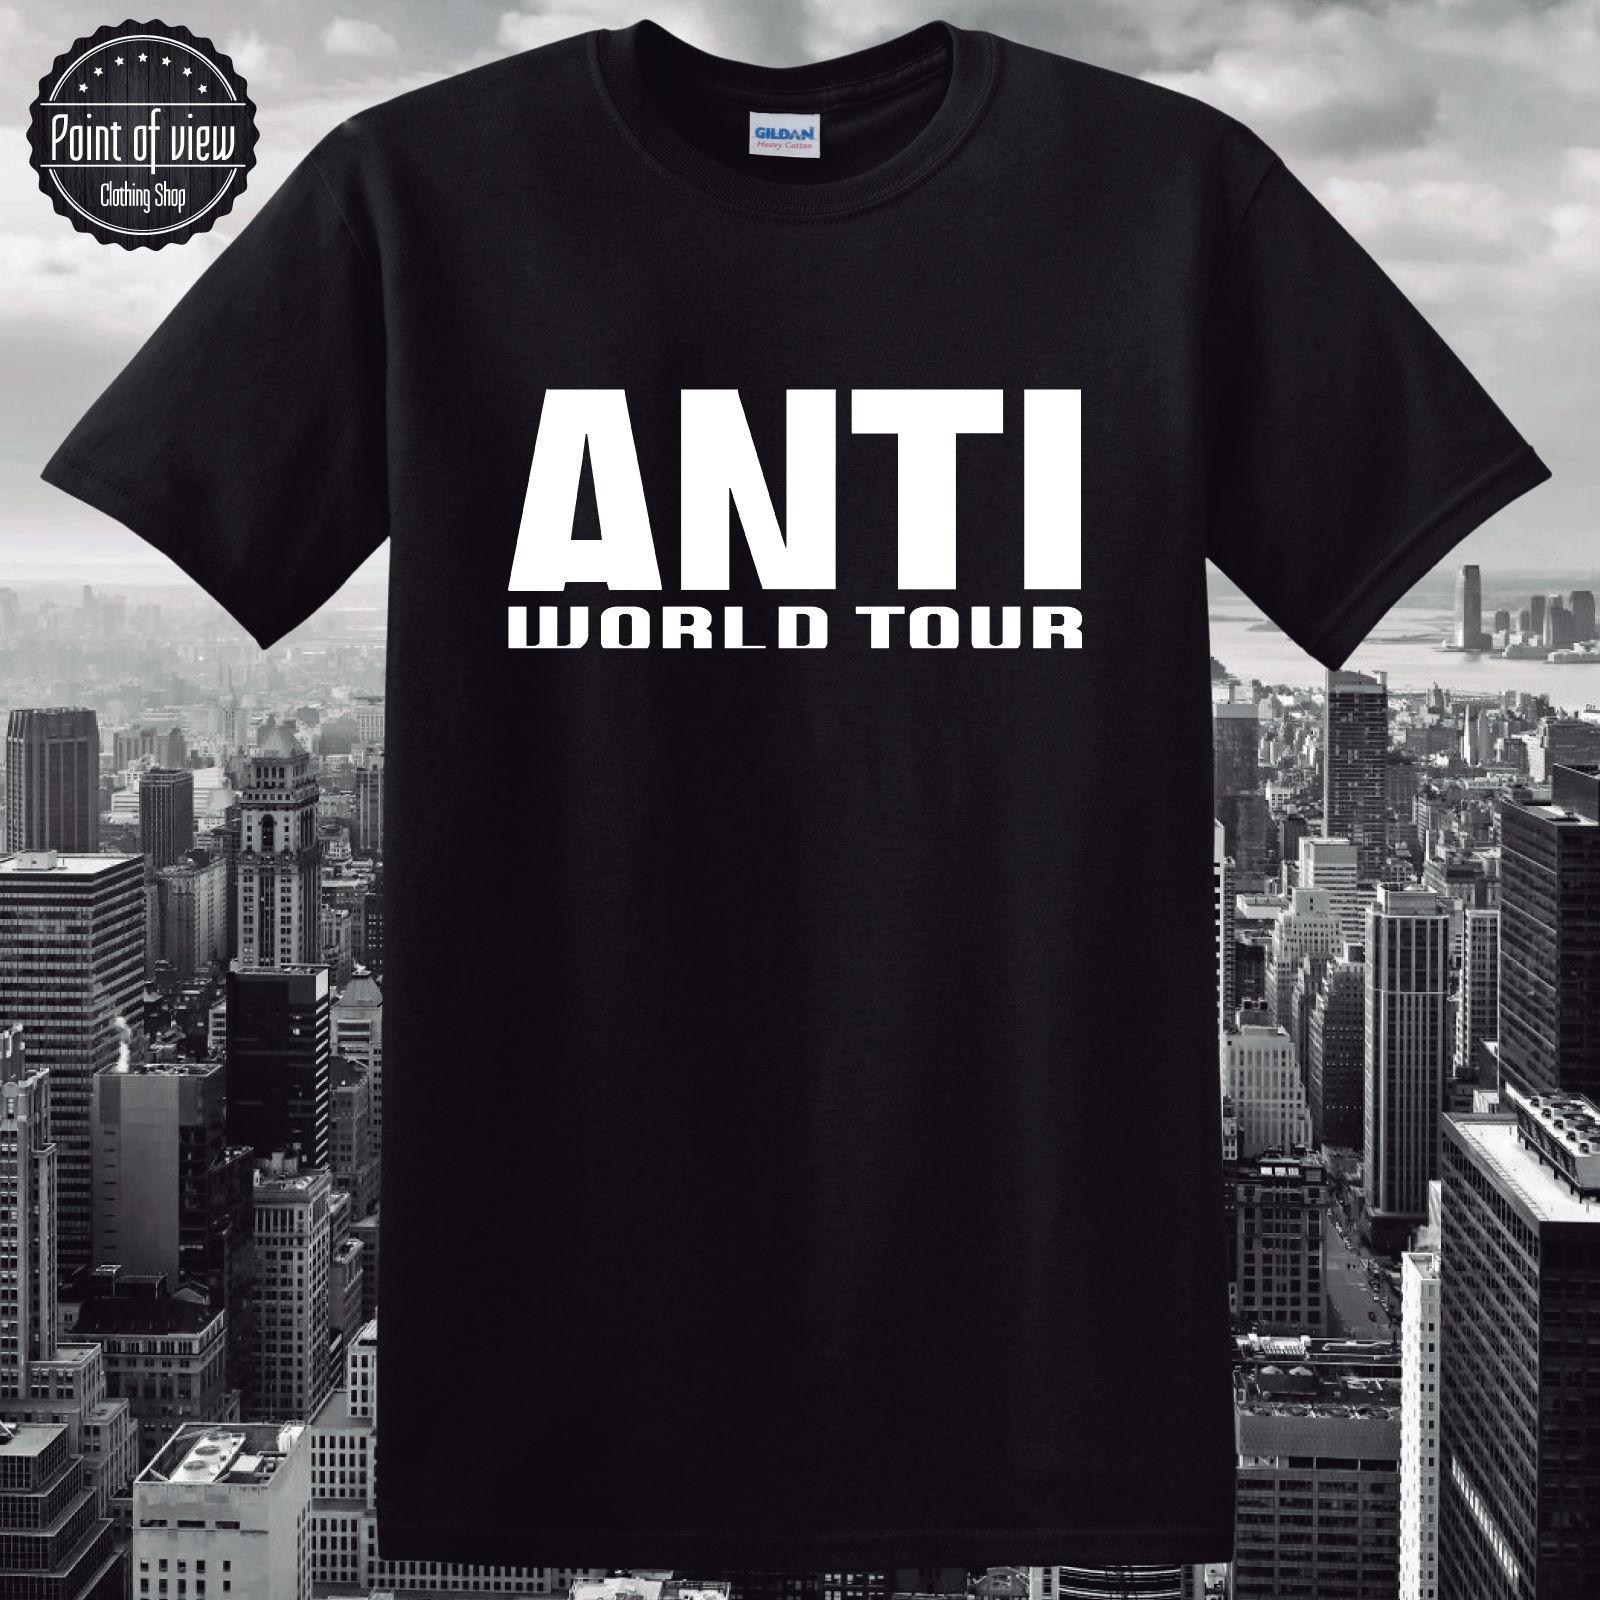 Jay z black t shirt white cross - Jay Z Black T Shirt White Cross T Shirt Rihanna Anti Tour 2016 Fanshirt Rihanna Download